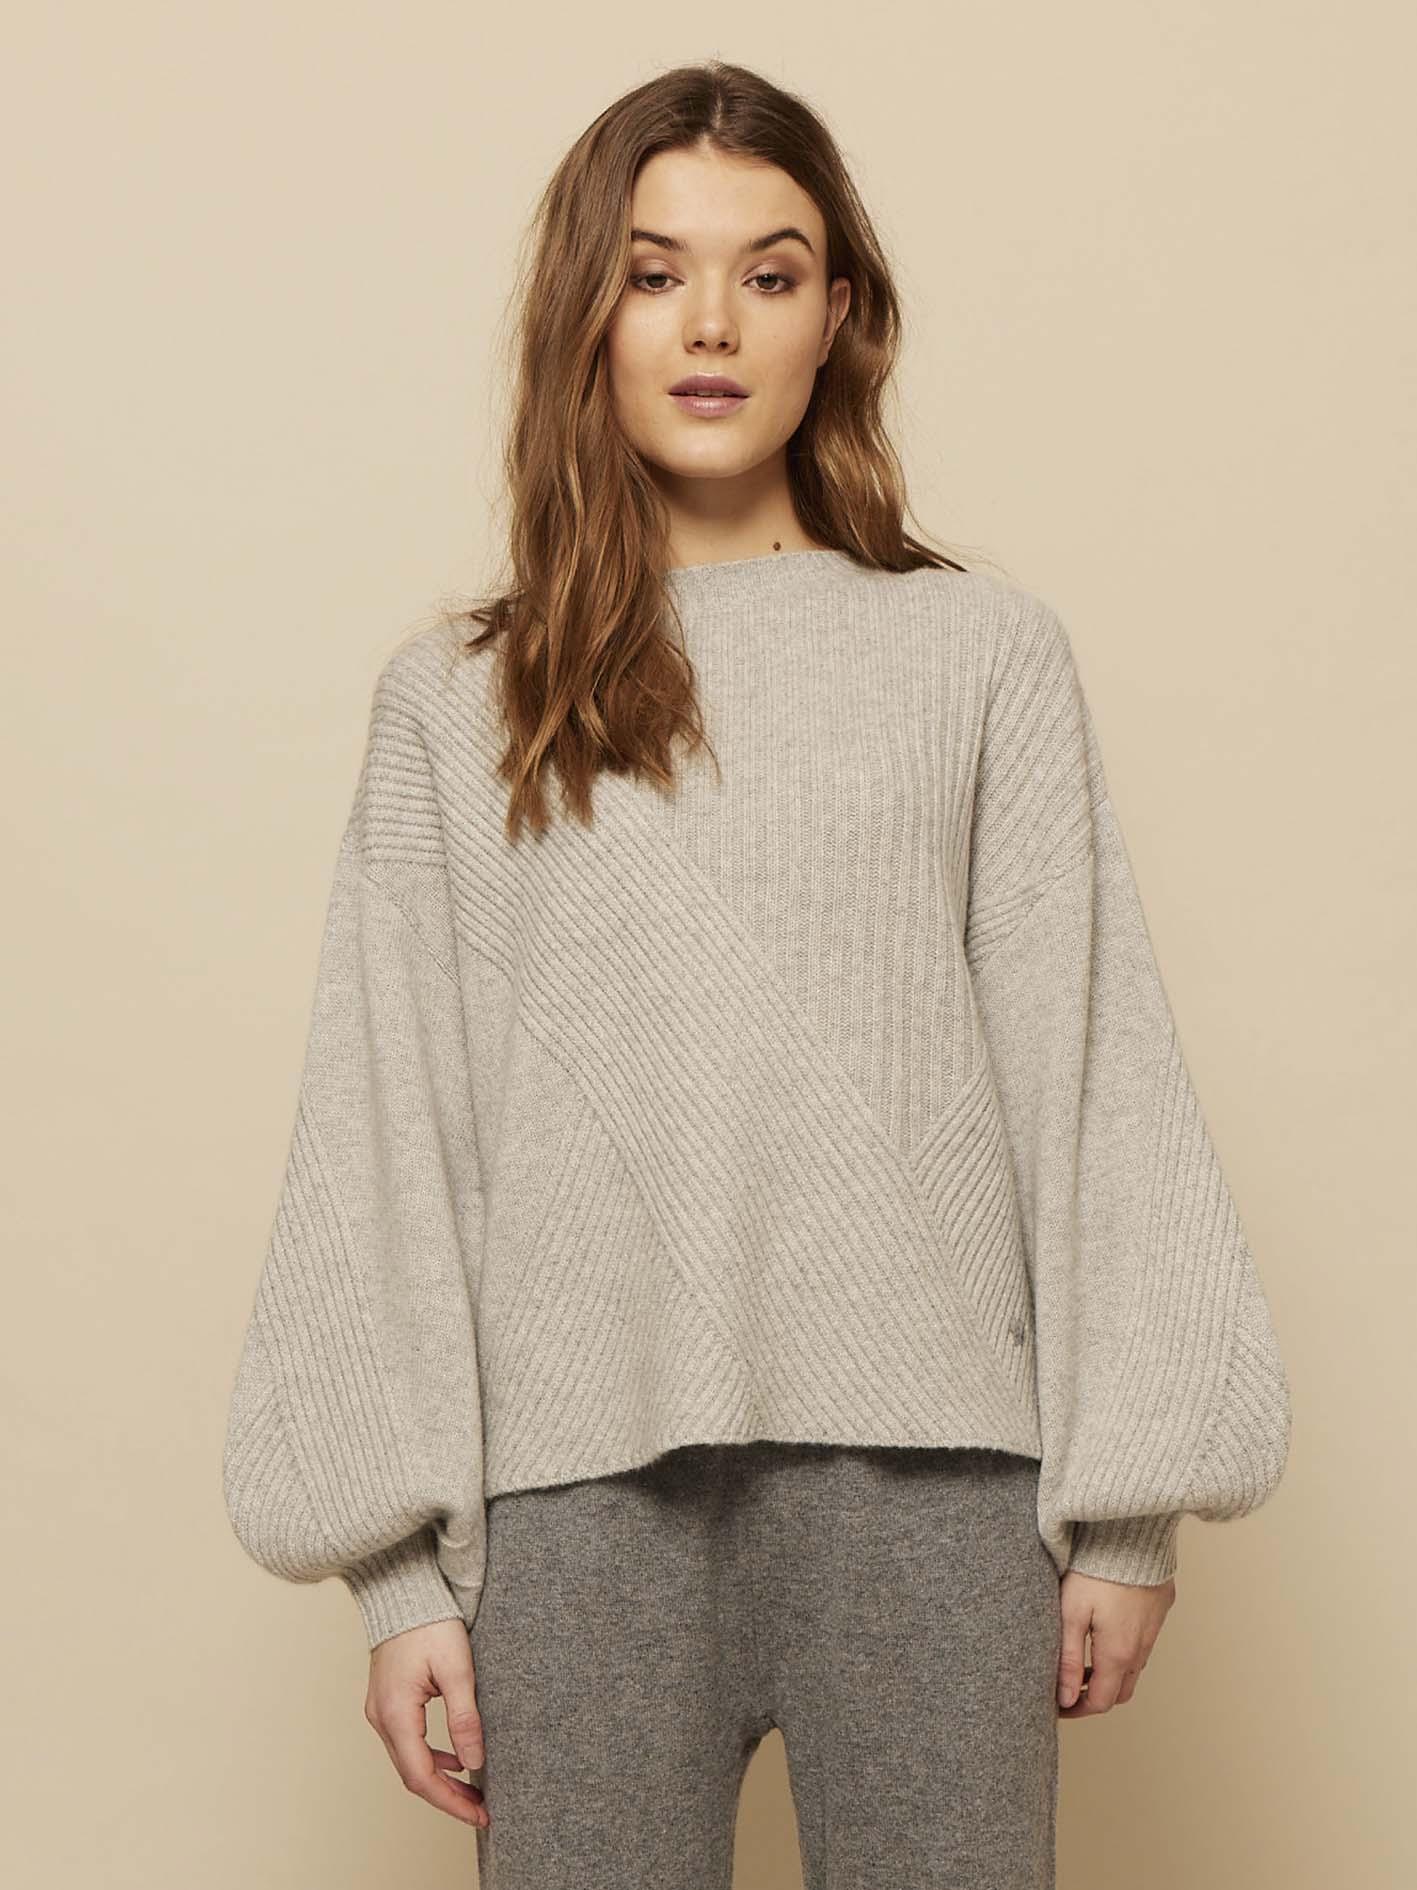 Louise cashmere sweater fra Wuth Copenhagen i premium 100% cashmere. Den nyeste AW21 kollektion for vinter.